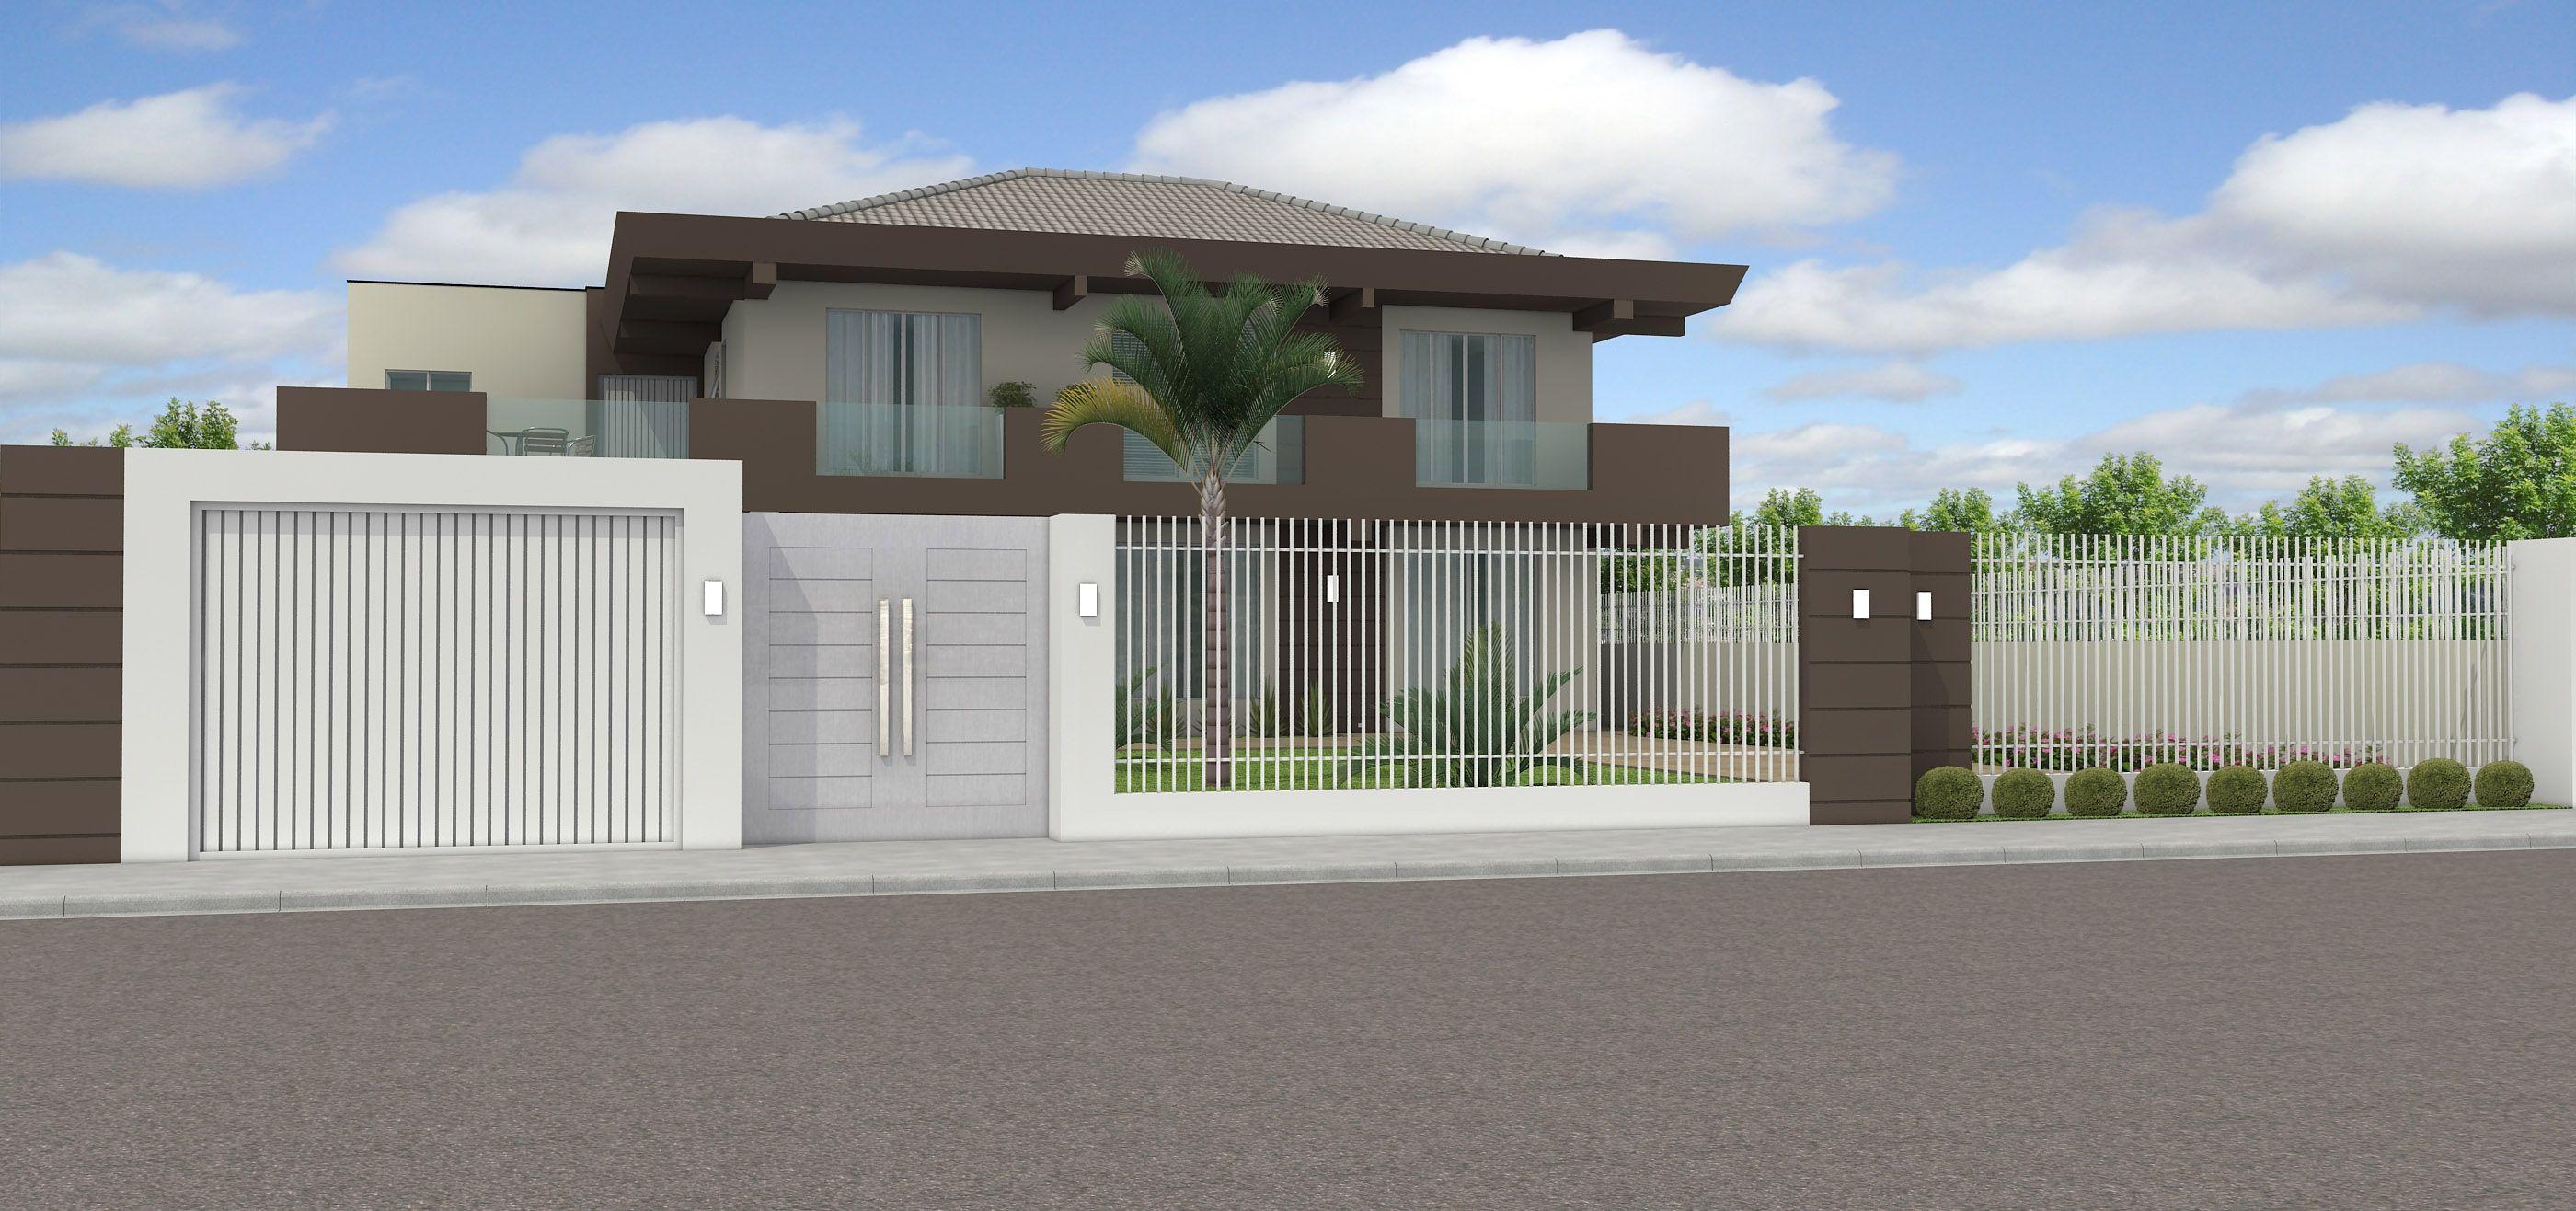 Port es de casas modernas 13 modelos para inspirar - Casas blancas modernas ...